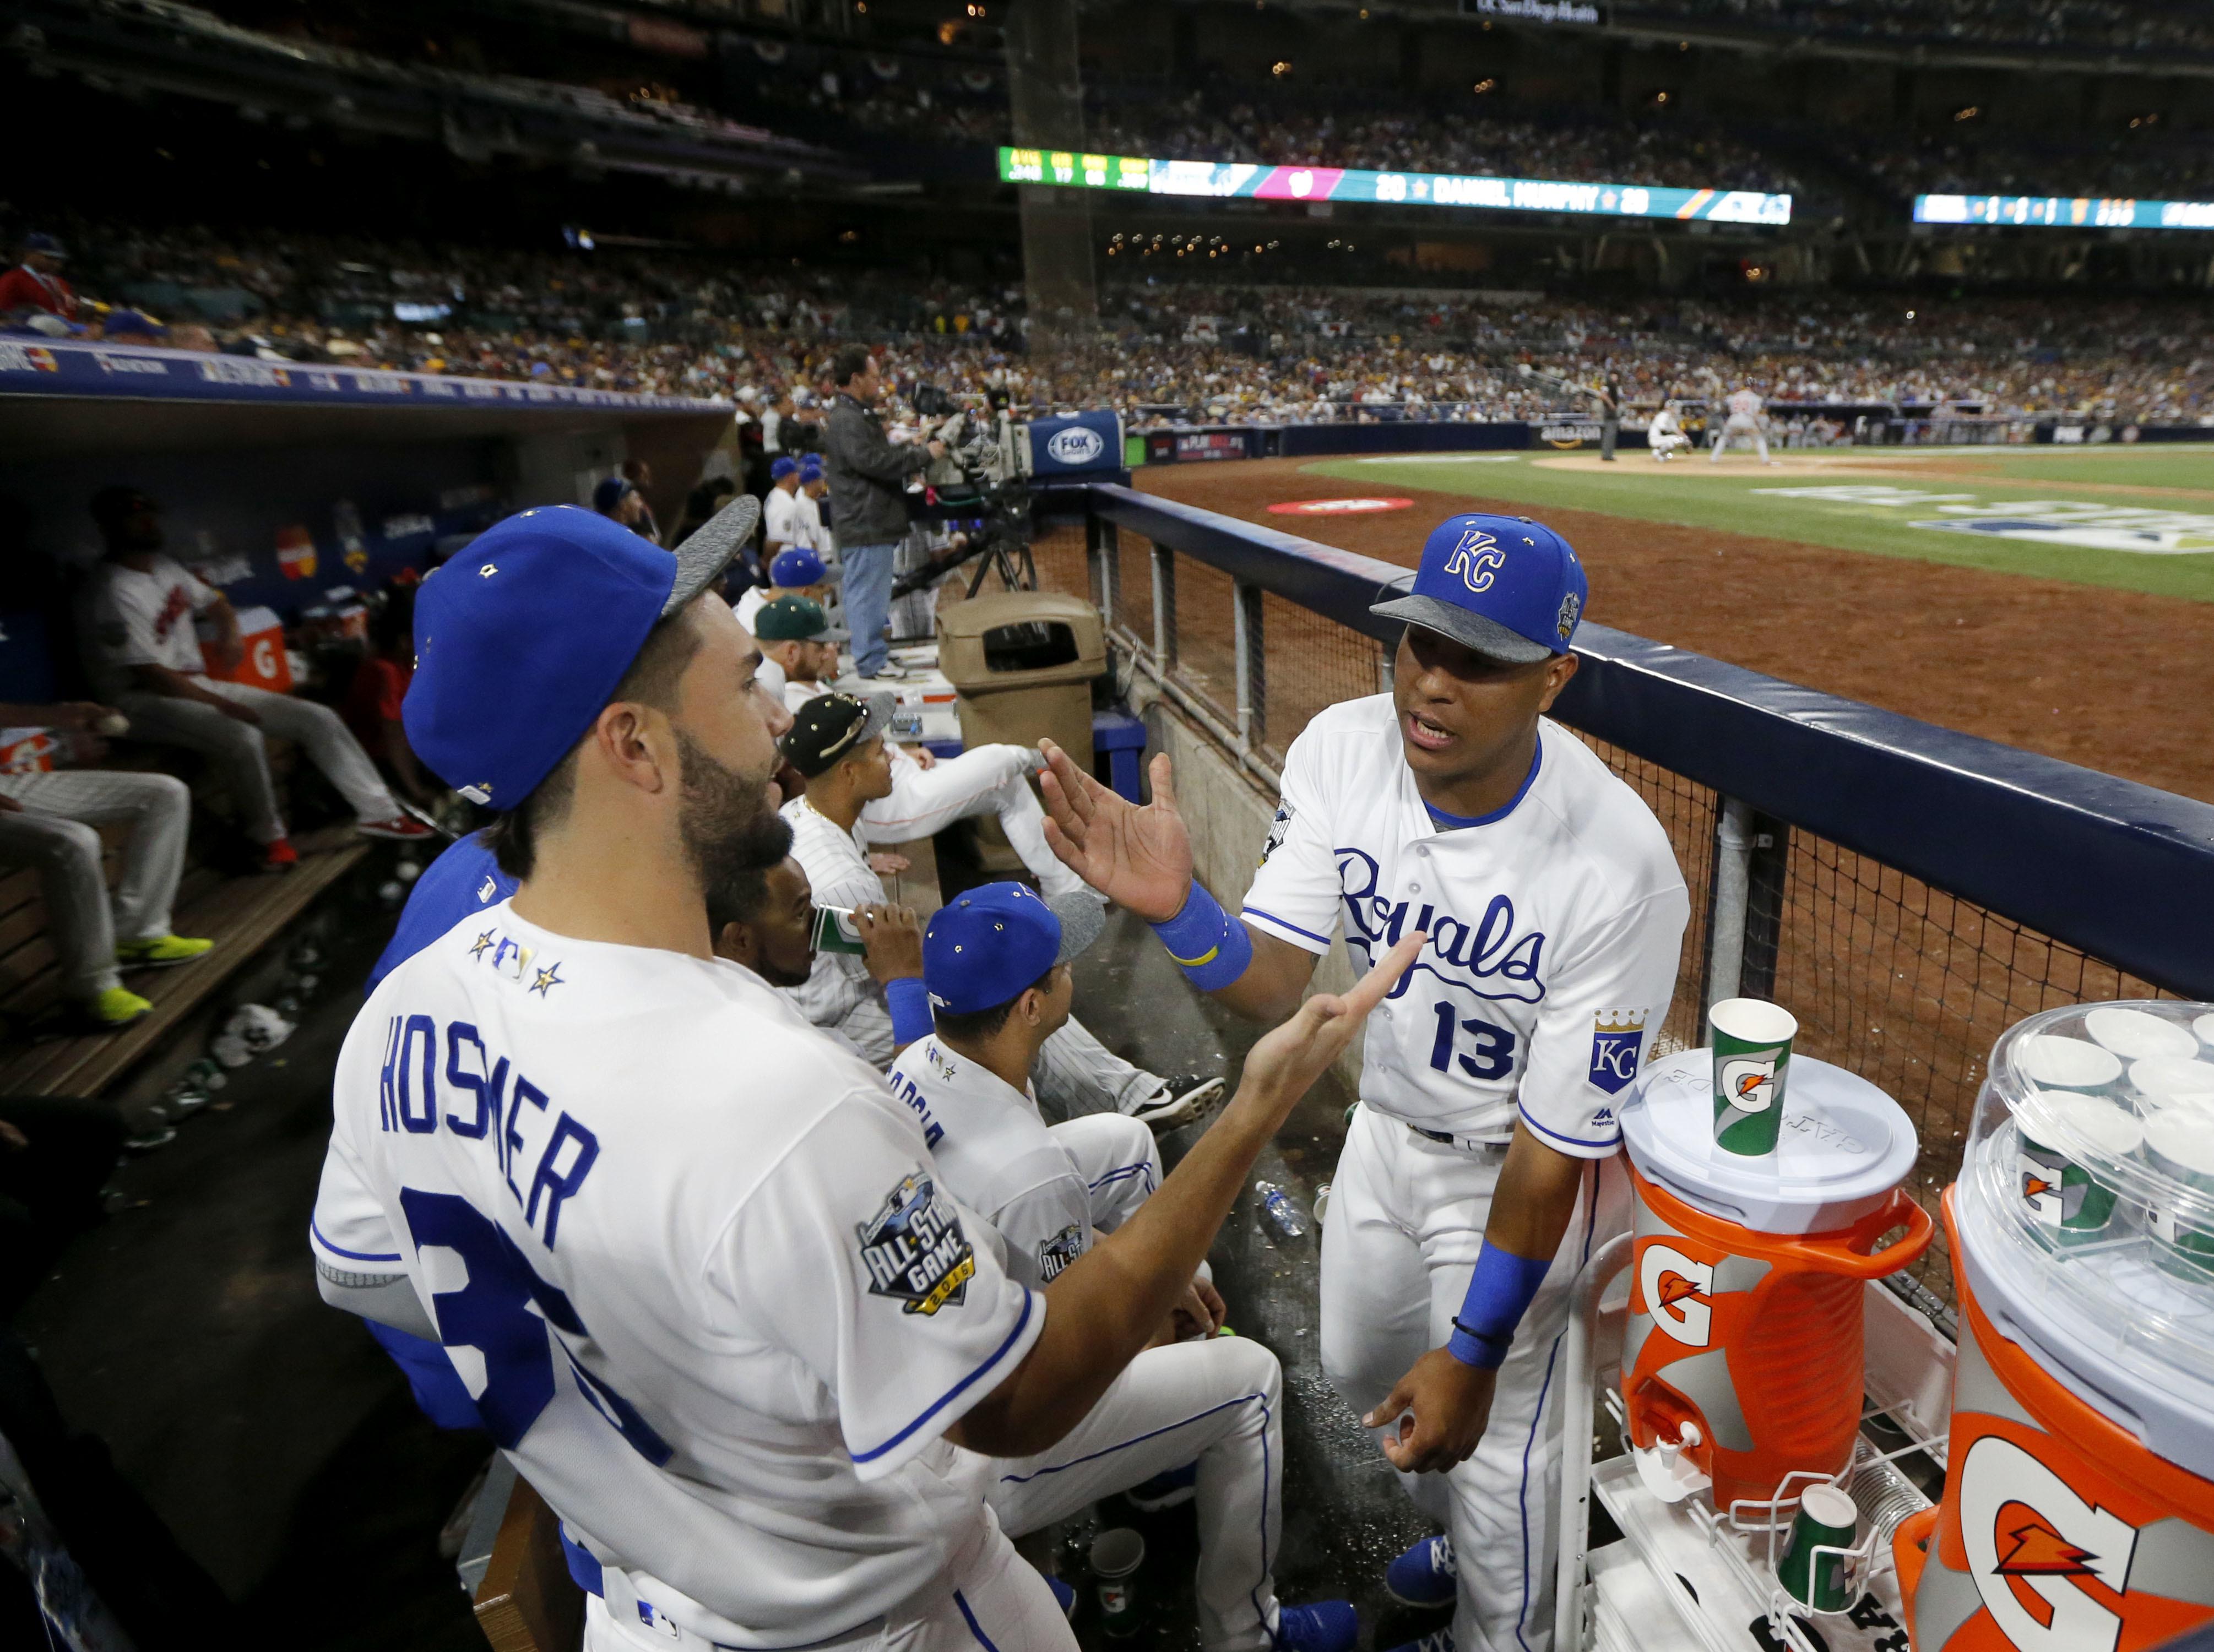 American League's Salvador Perez, of the Kansas City Royals, congratulates teammate Eric Hosmer, of the Kansas City Royals, for Hosmer's MVP award in the MLB baseball All-Star Game, Tuesday, July 12, 2016, in San Diego. The American League won 4-2. (AP Ph